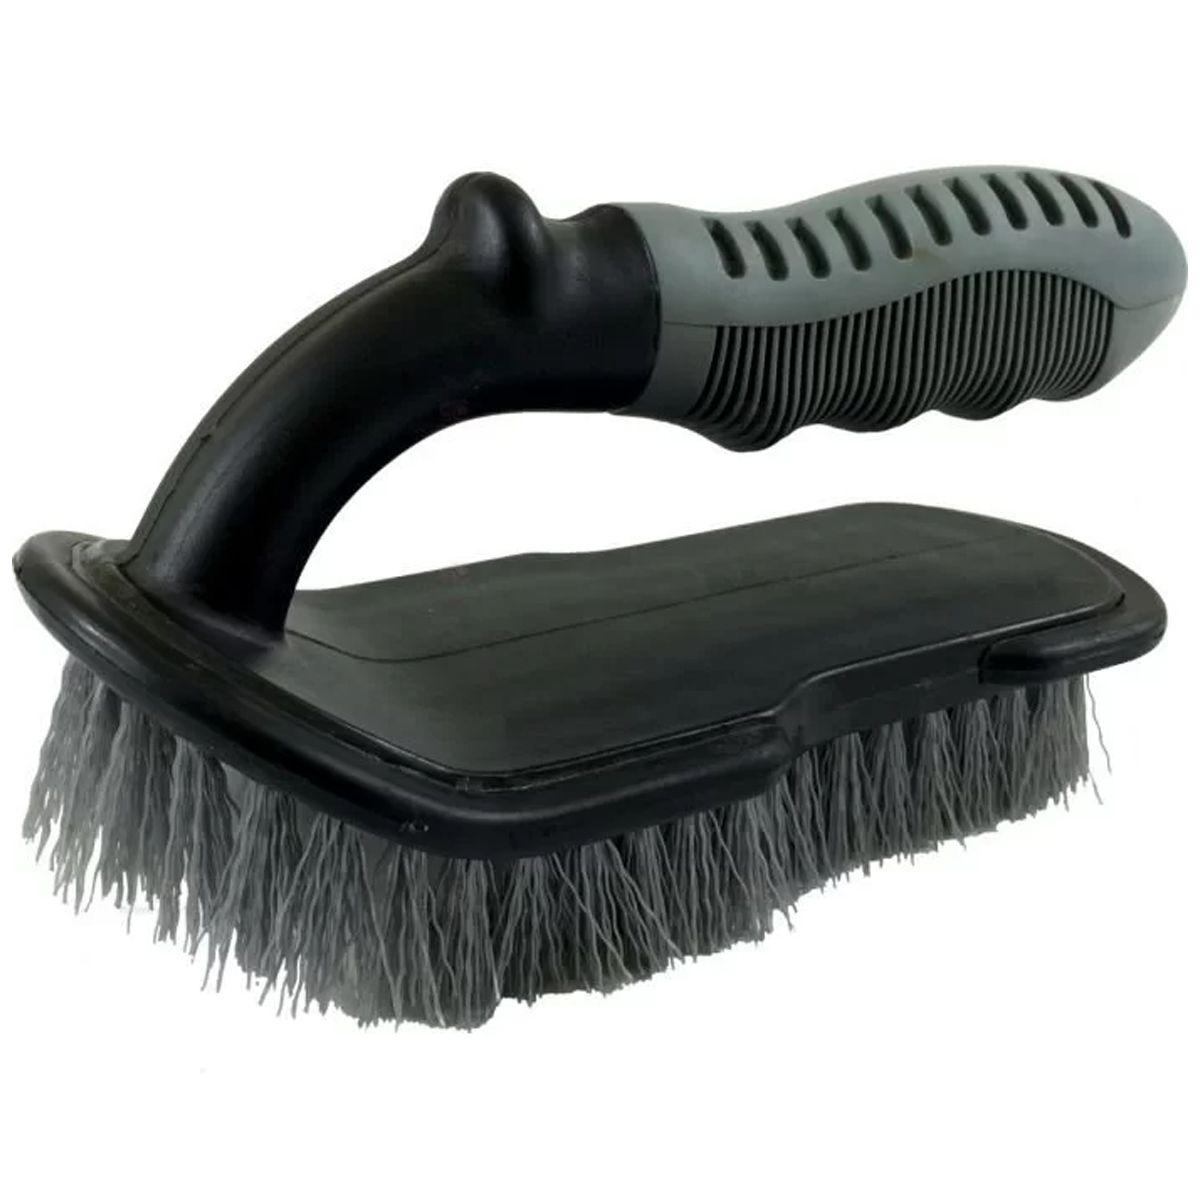 Escova de Cerdas Duras para Limpeza de Carpetes e Tecidos Mandala